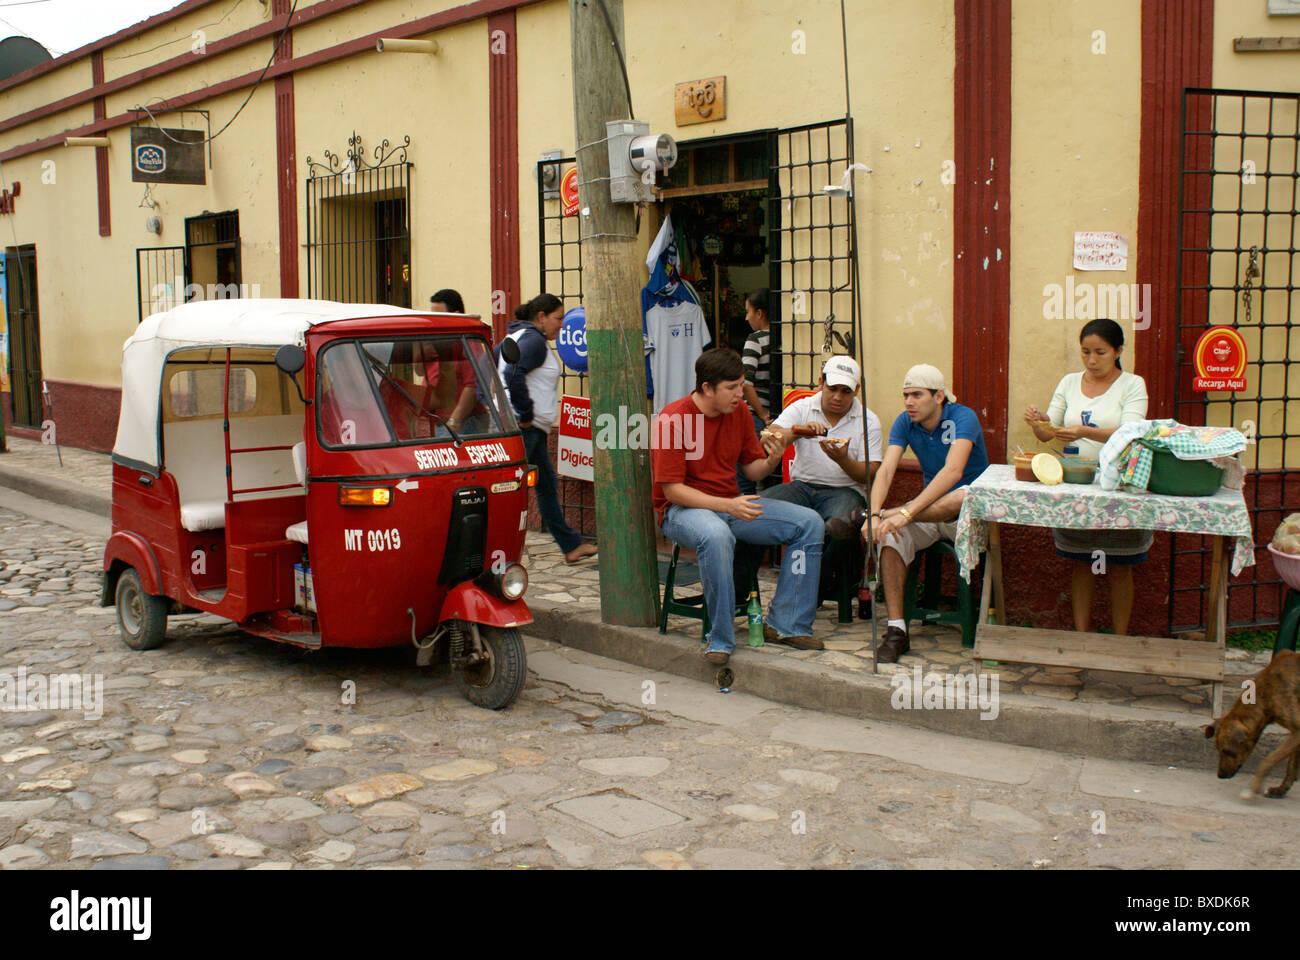 Busy street corner in the town of Copan Ruinas, Honduras - Stock Image